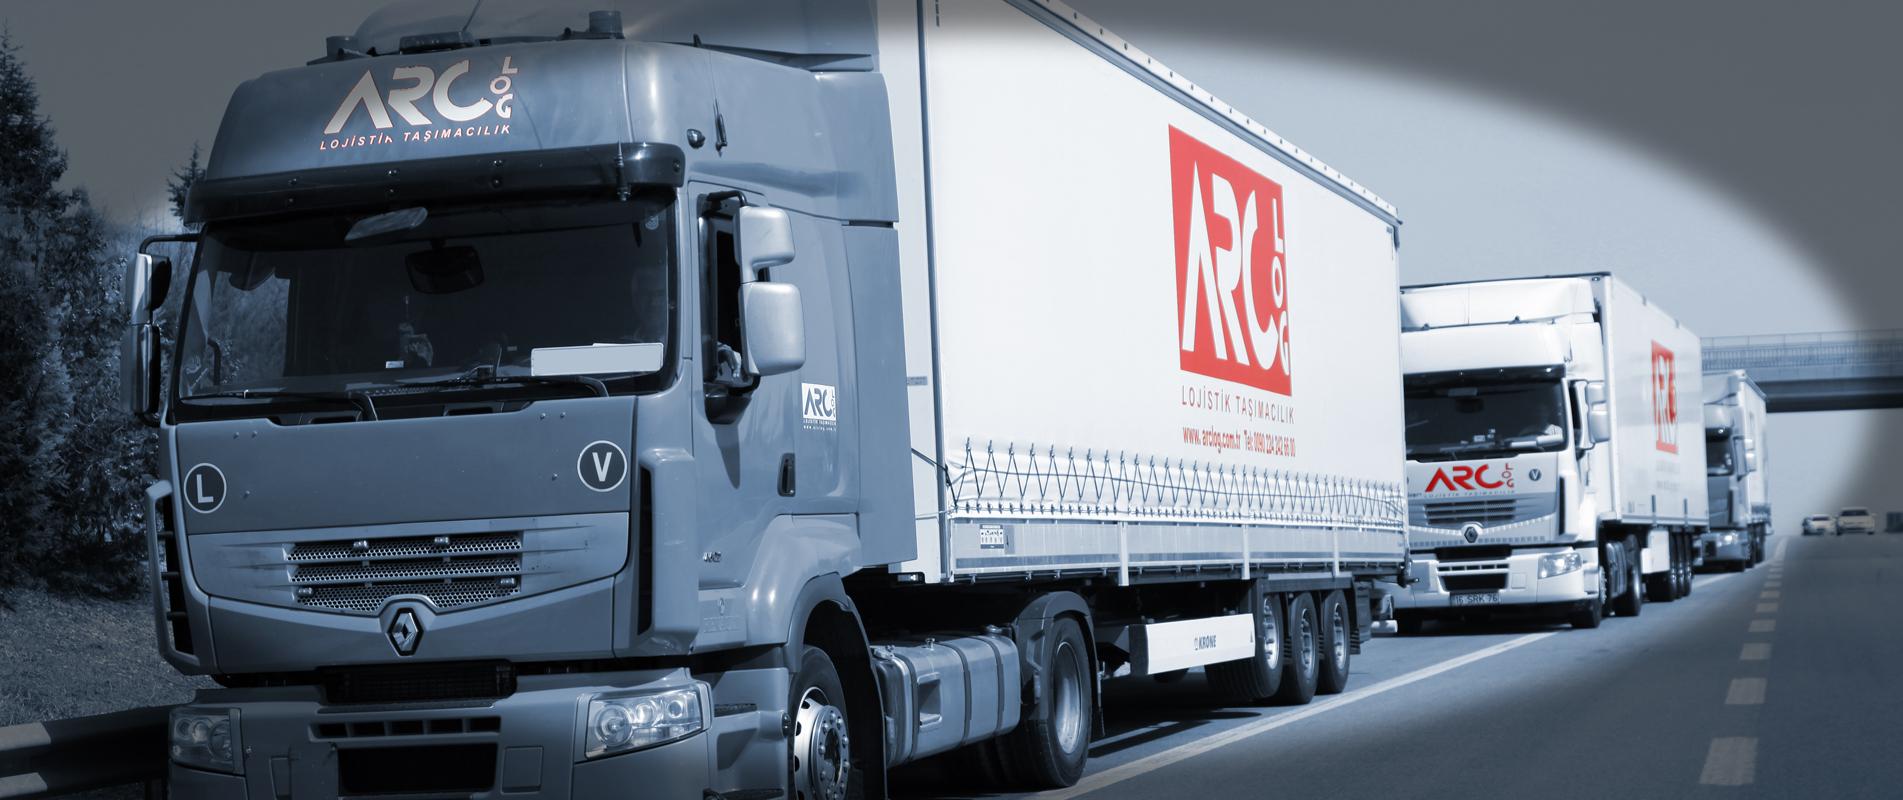 ARC Lojistik, Filosunu 40 Adet F-MAX ile Genişletti